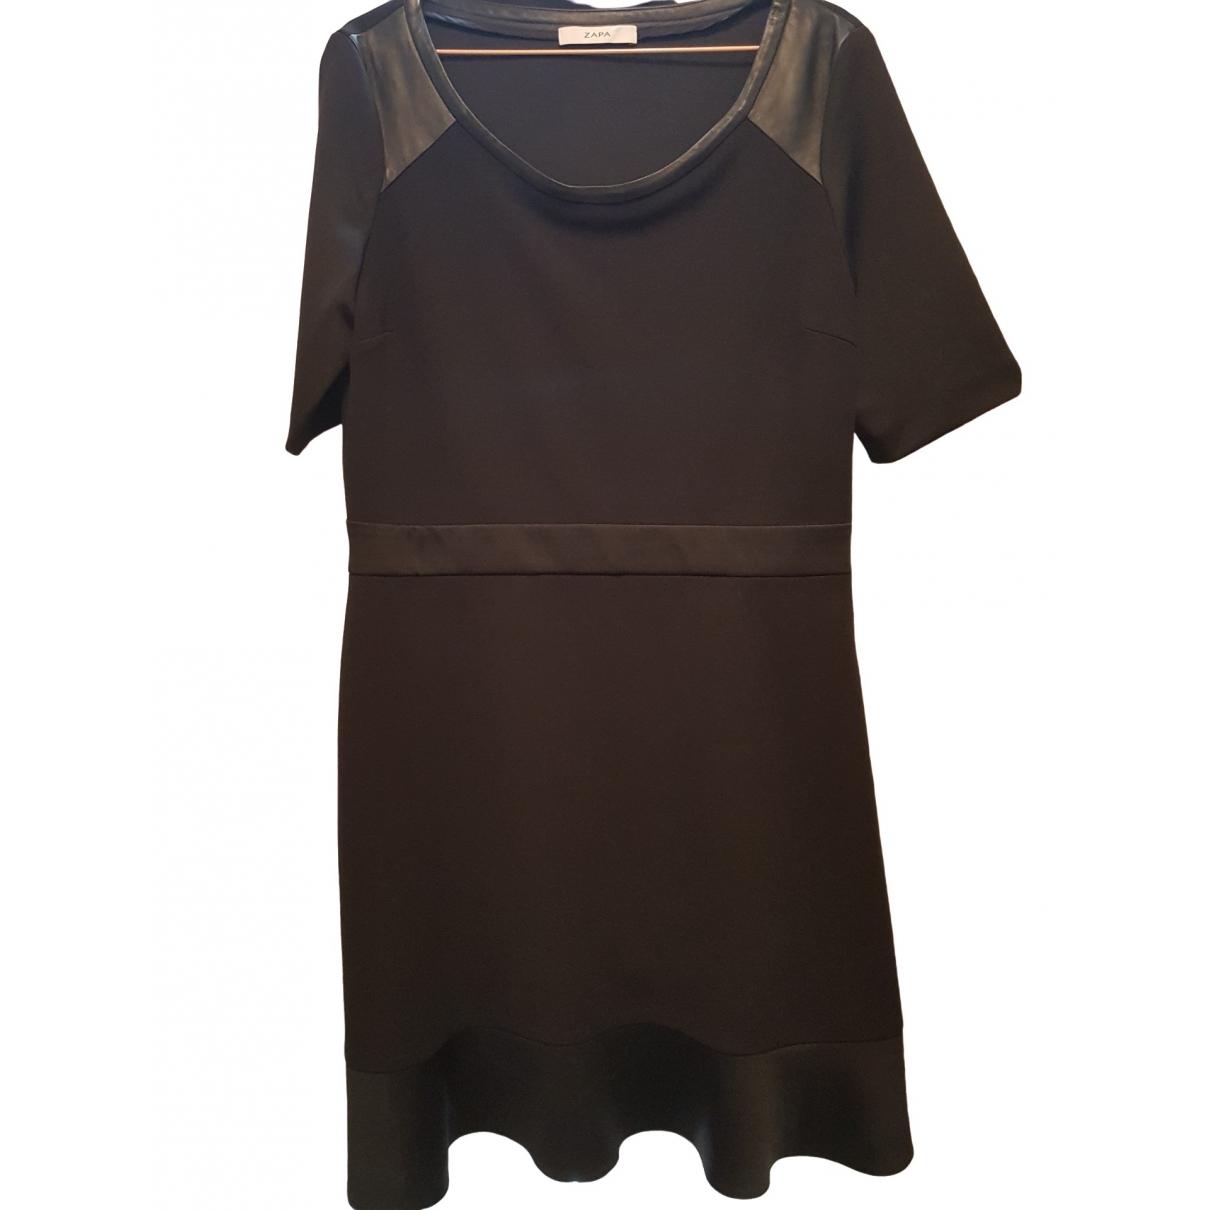 Zapa \N Kleid in  Schwarz Polyester